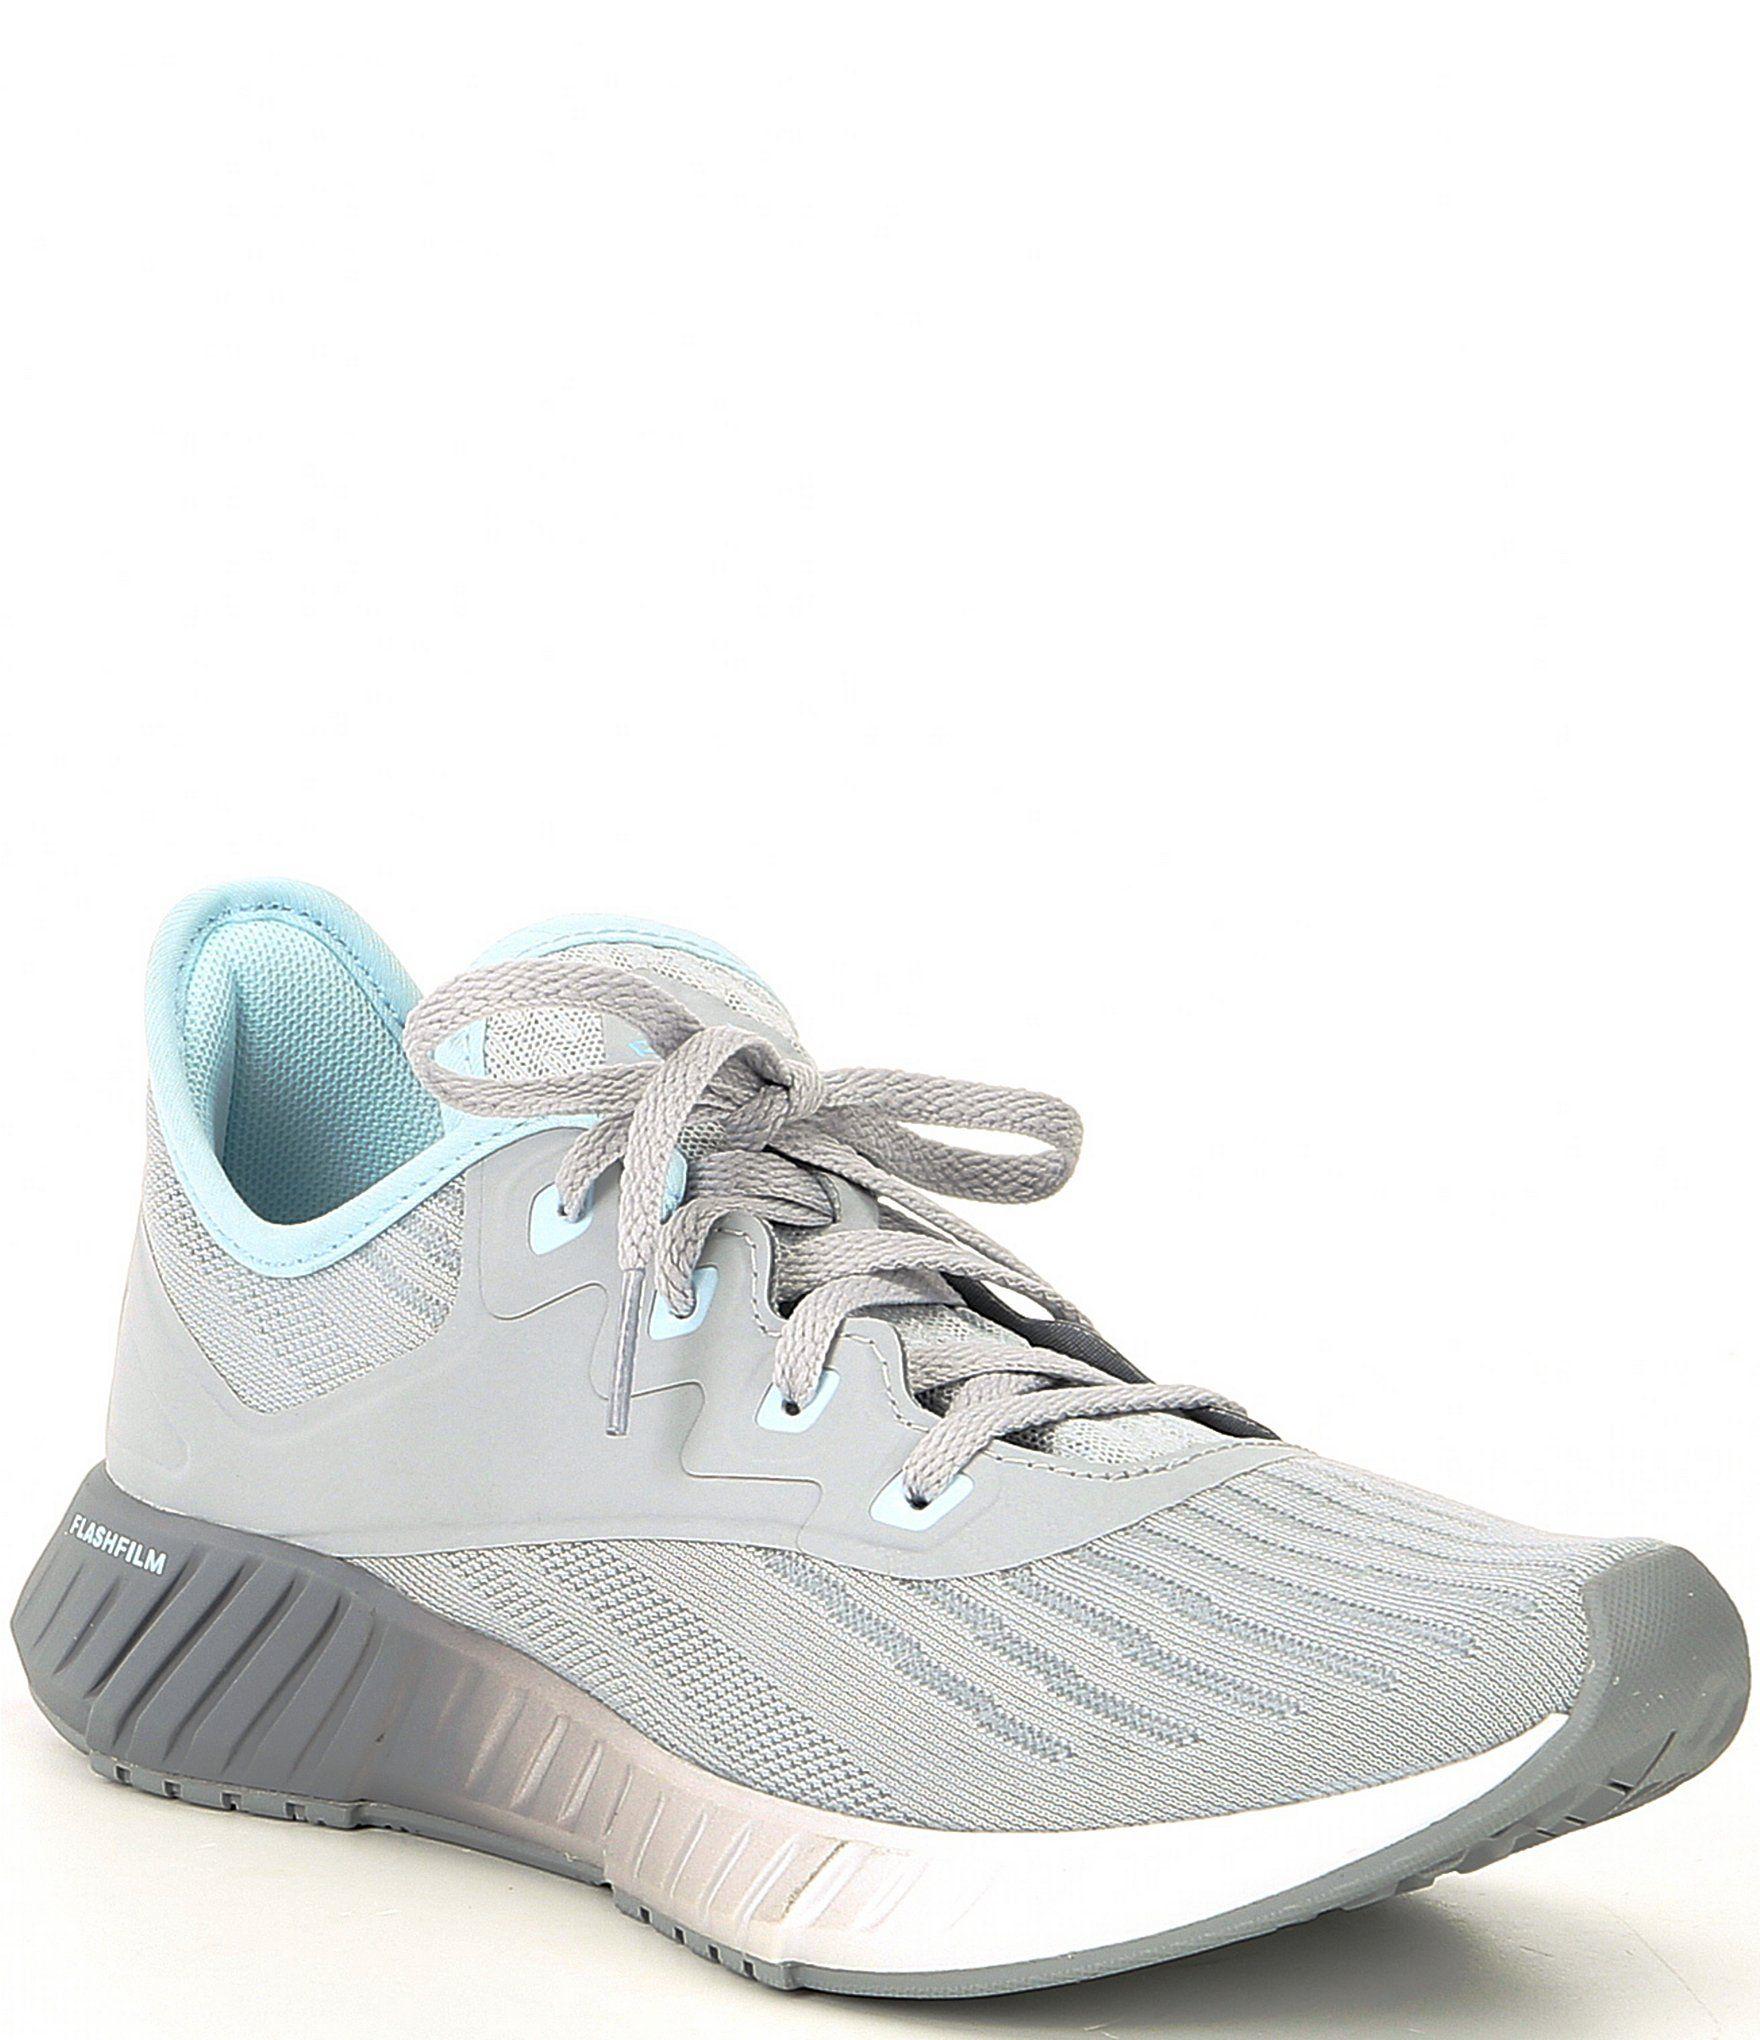 Flashfilm 2-0 Mesh Running Shoes